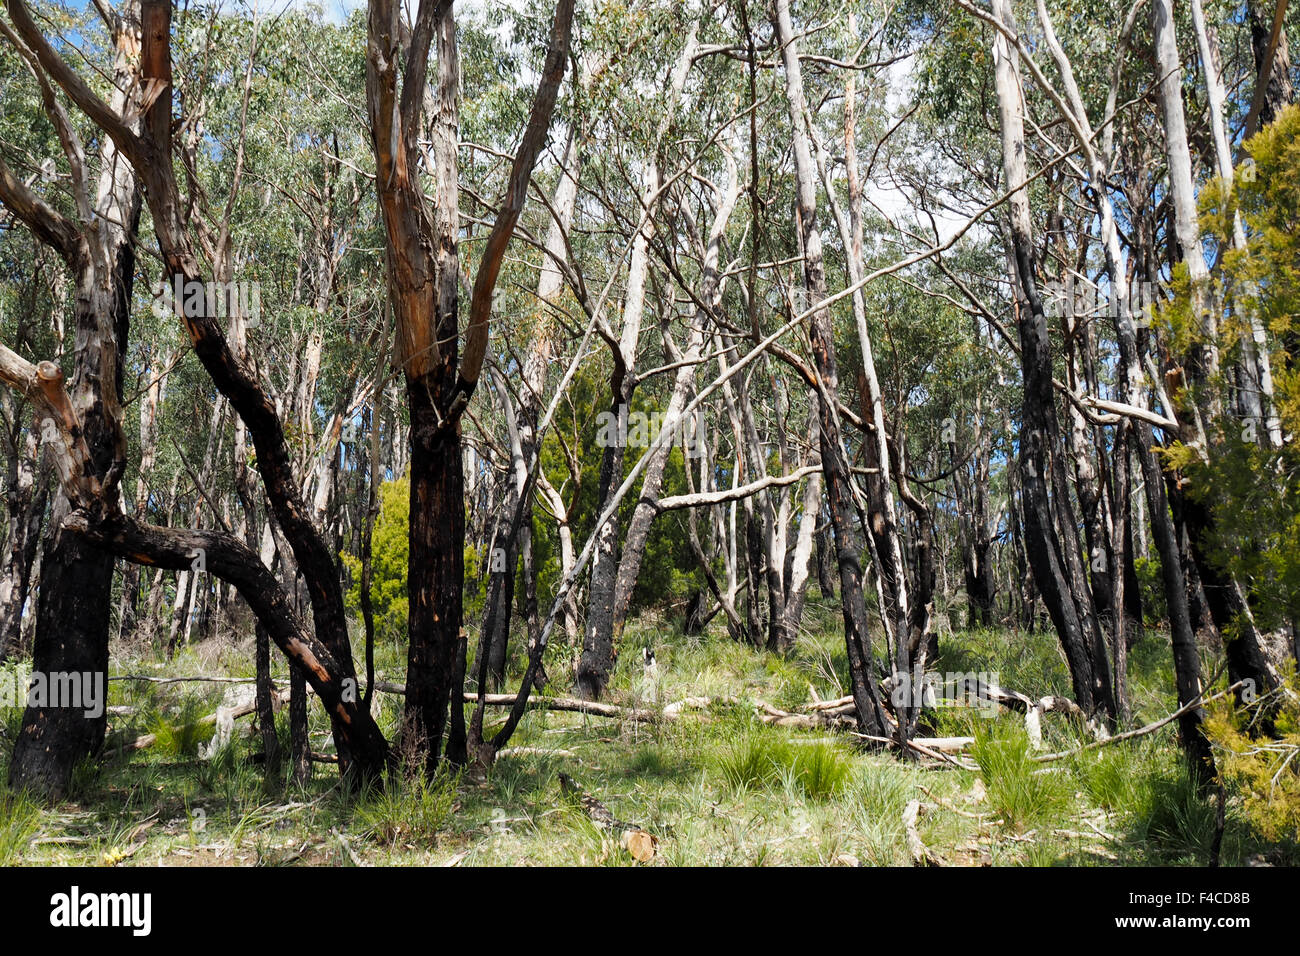 Eucalyptus trees in the Mount Lofty Botanical garden. - Stock Image